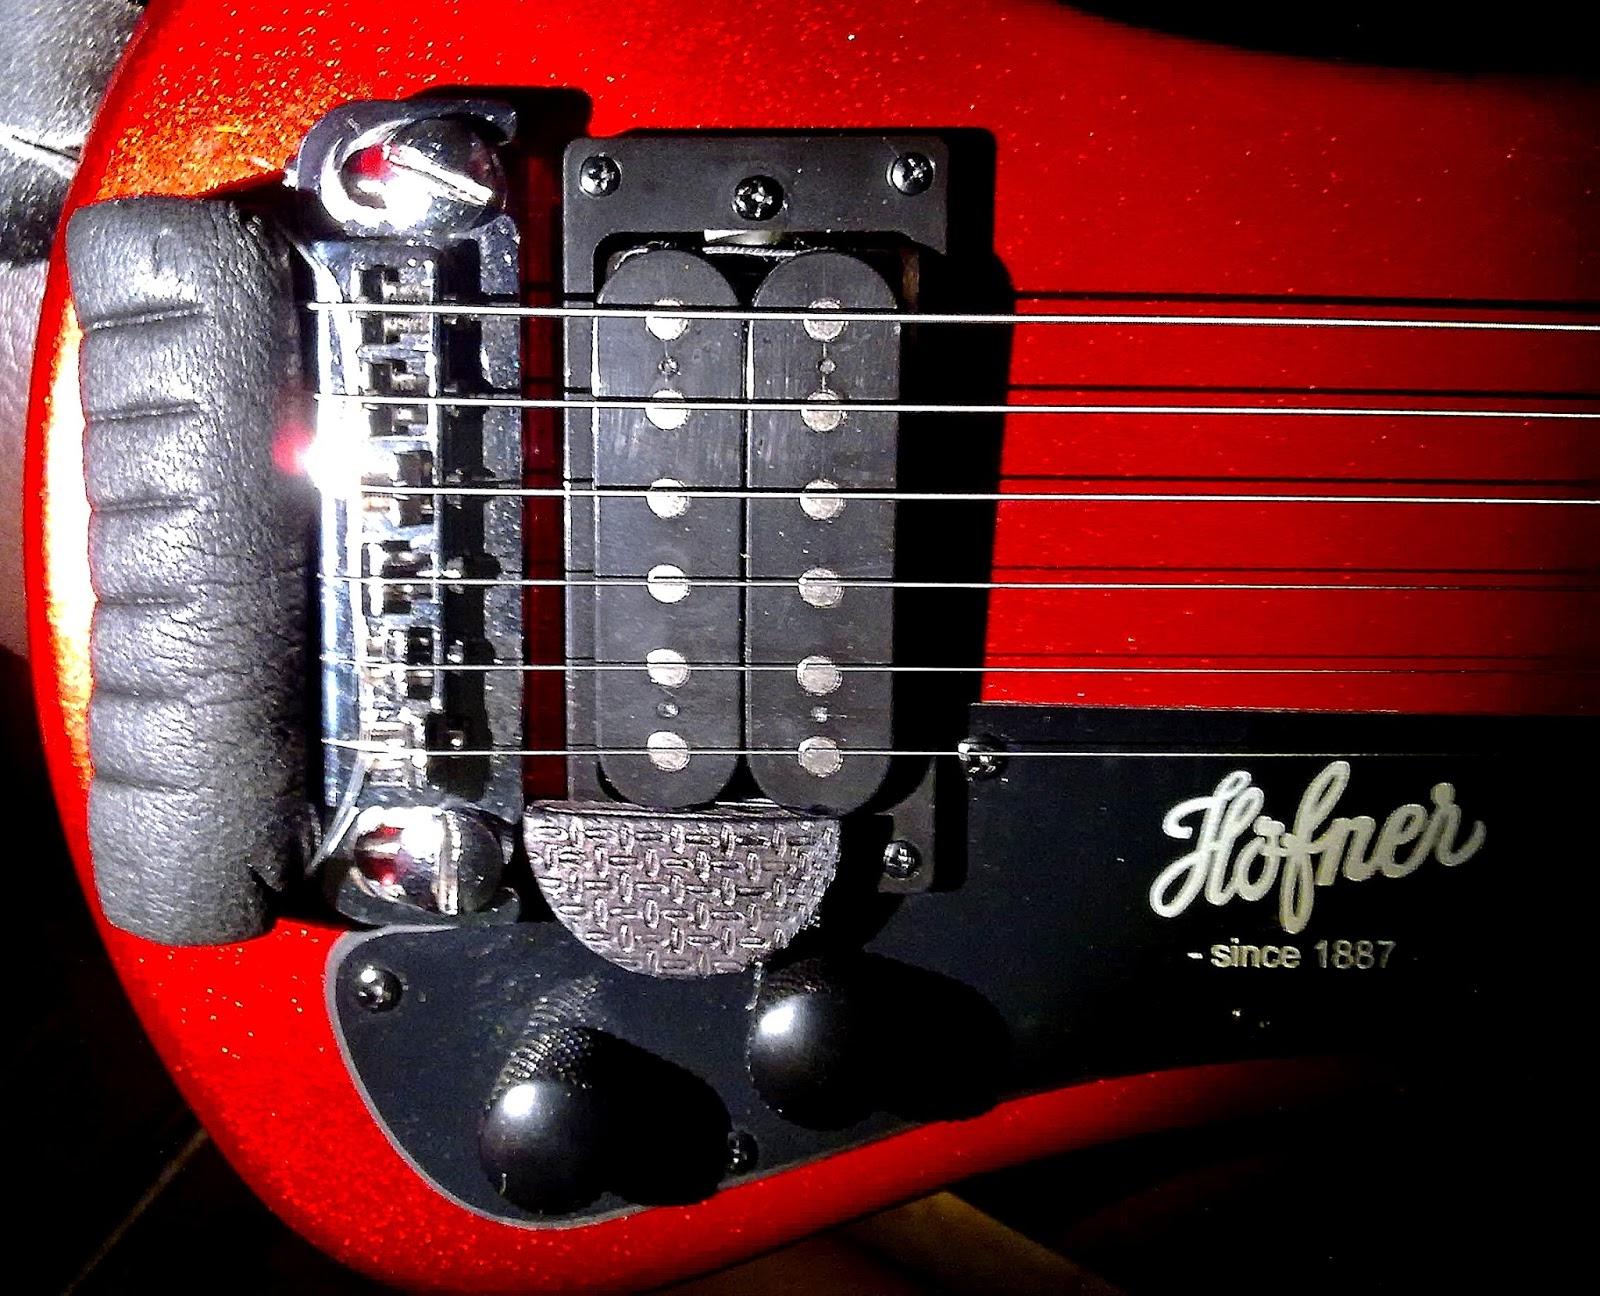 Hfner Shorty Diy Modifications Writers Block Tgh Hofner Bass Wiring Diagram Pinkie Pad And Wrist Added